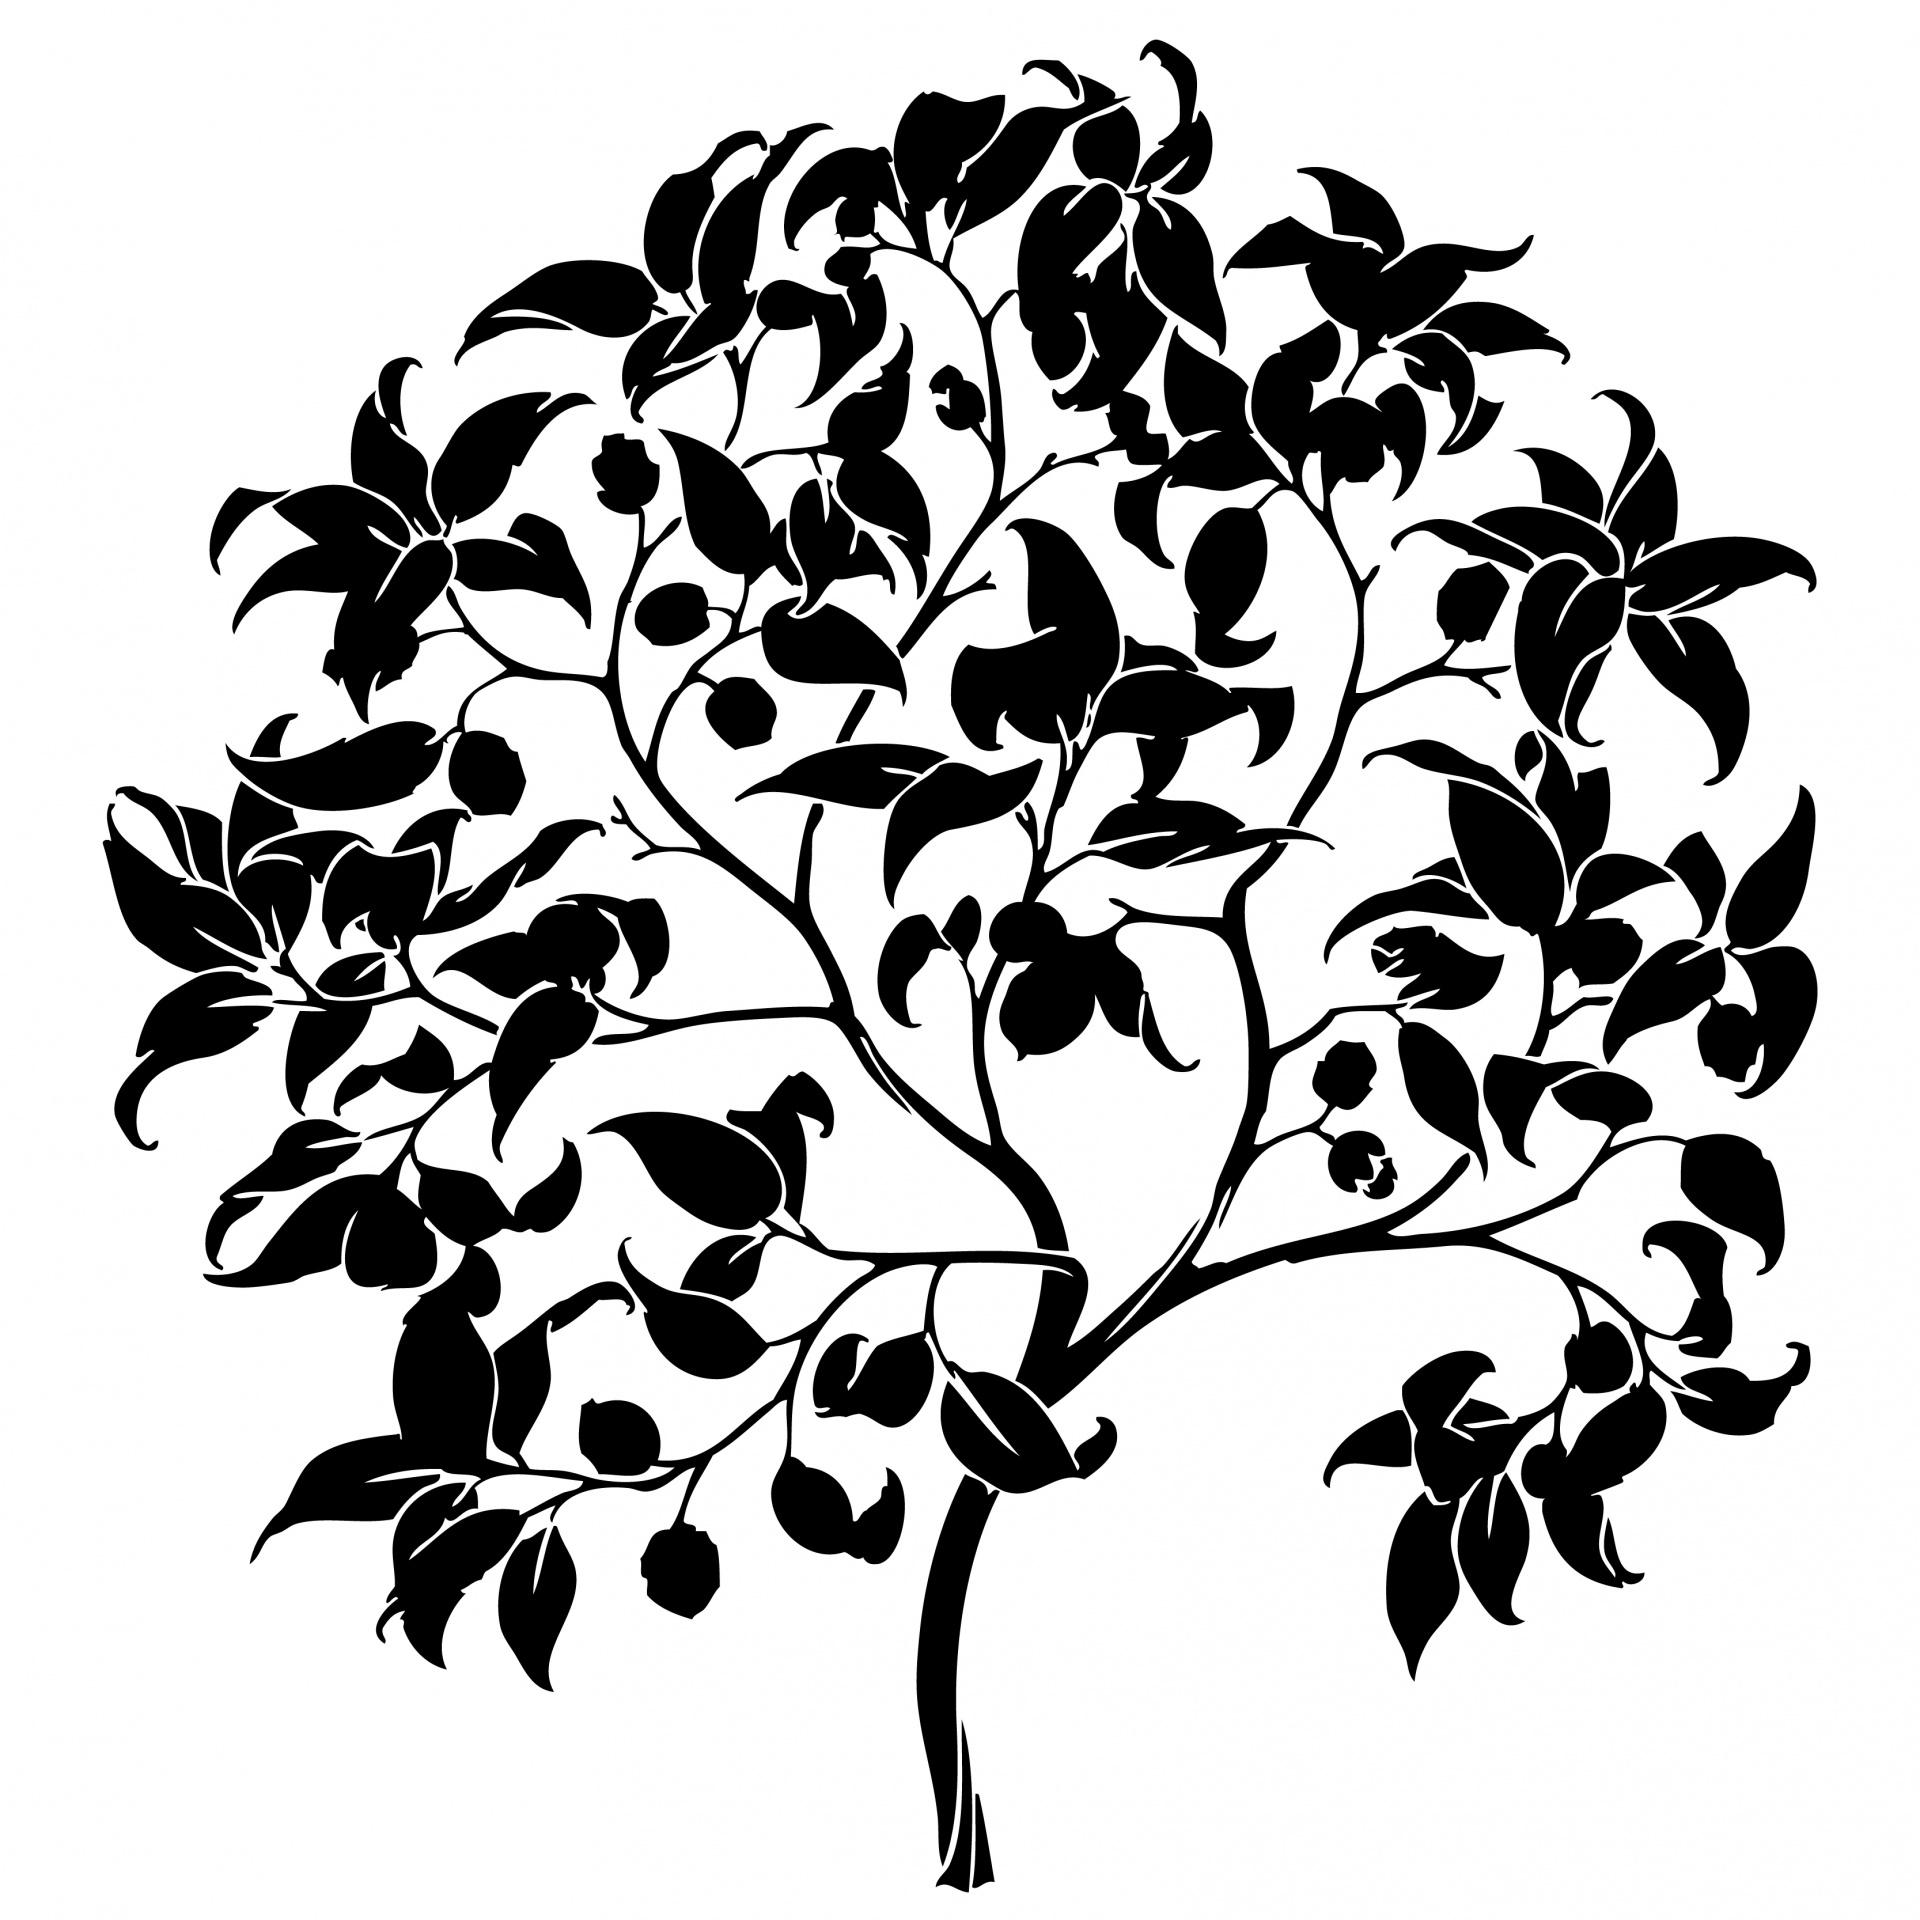 1920x1920 Tree Silhouette Clipart Free Stock Photo